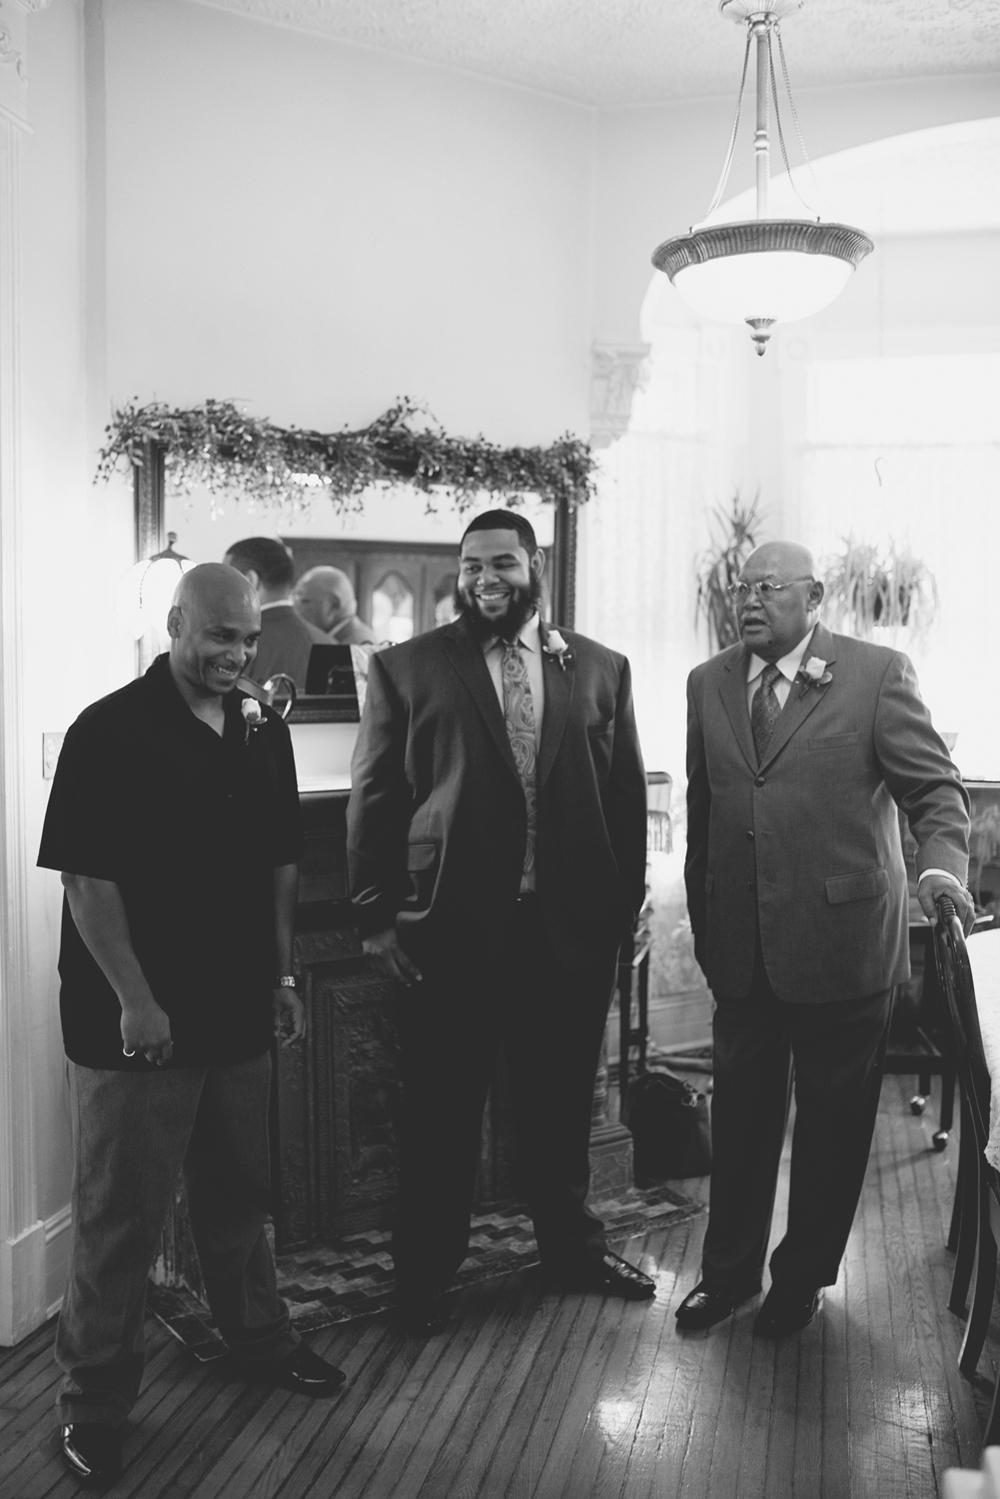 Magnolia House Inn Wedding | Hampton, Virginia Wedding | Casual groomsmen pictures